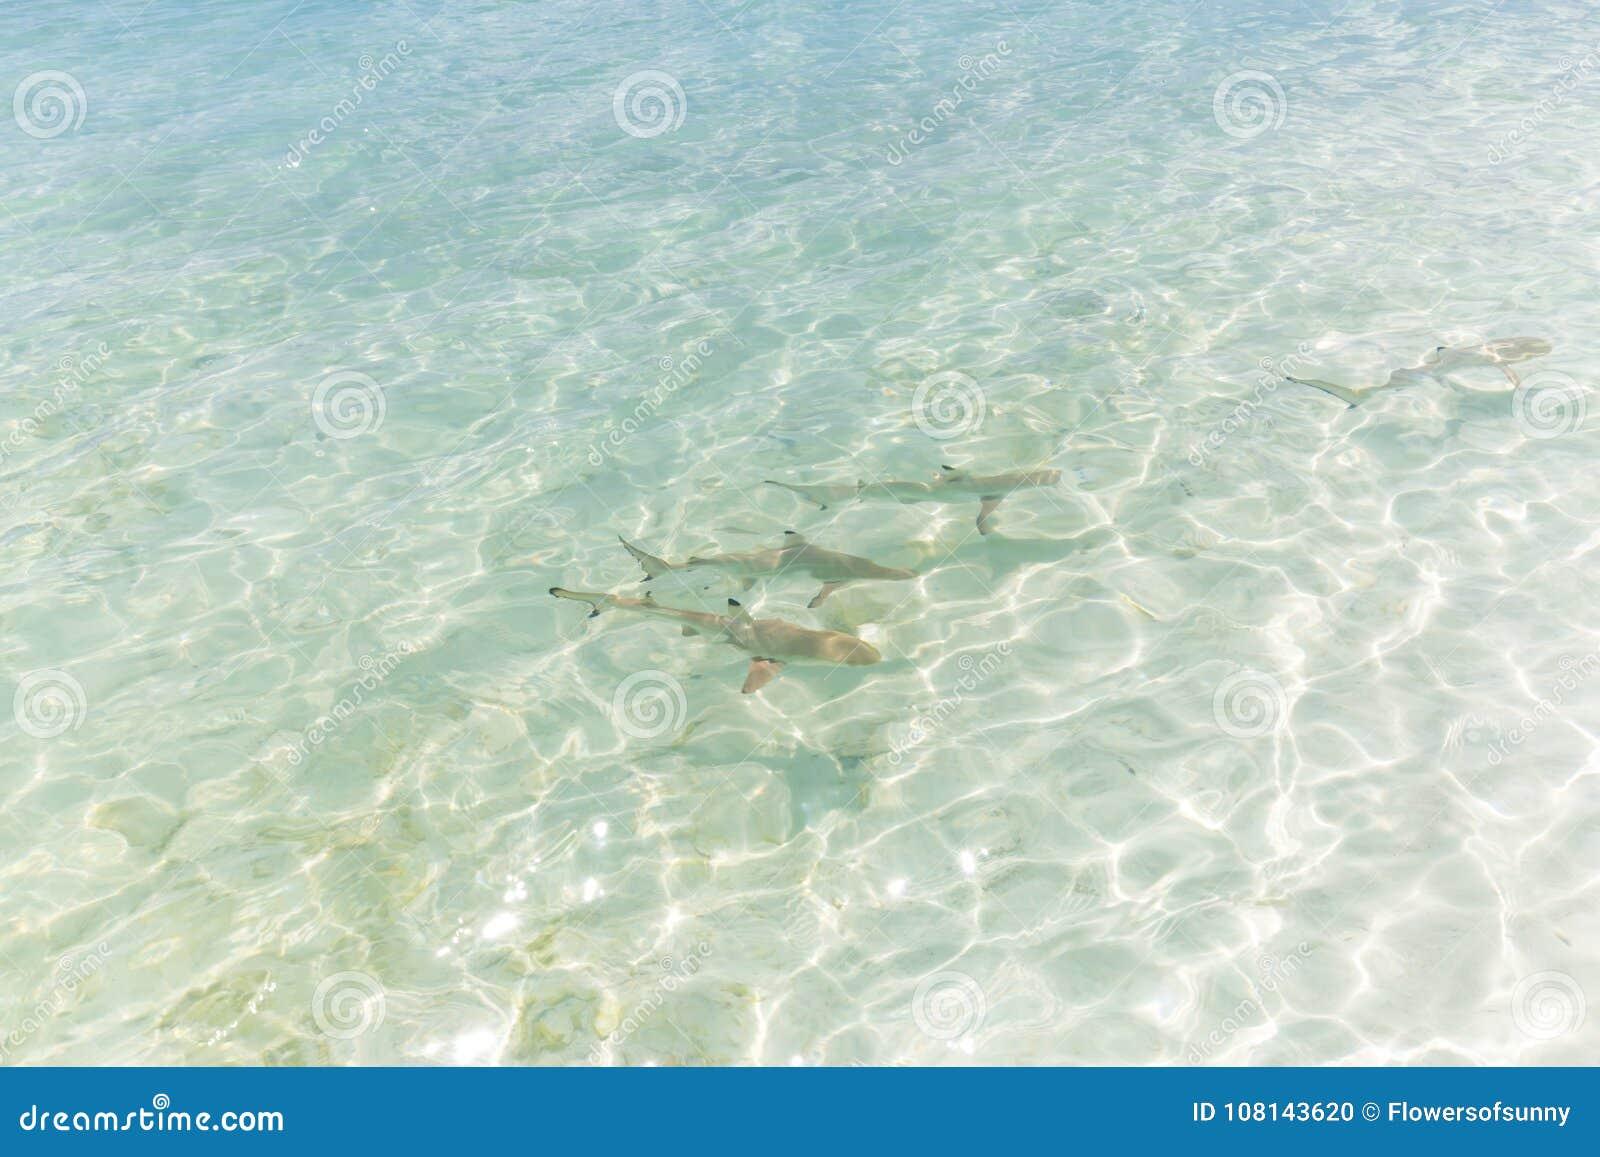 Black tip reef shark in Maldives pristine water hunting in group